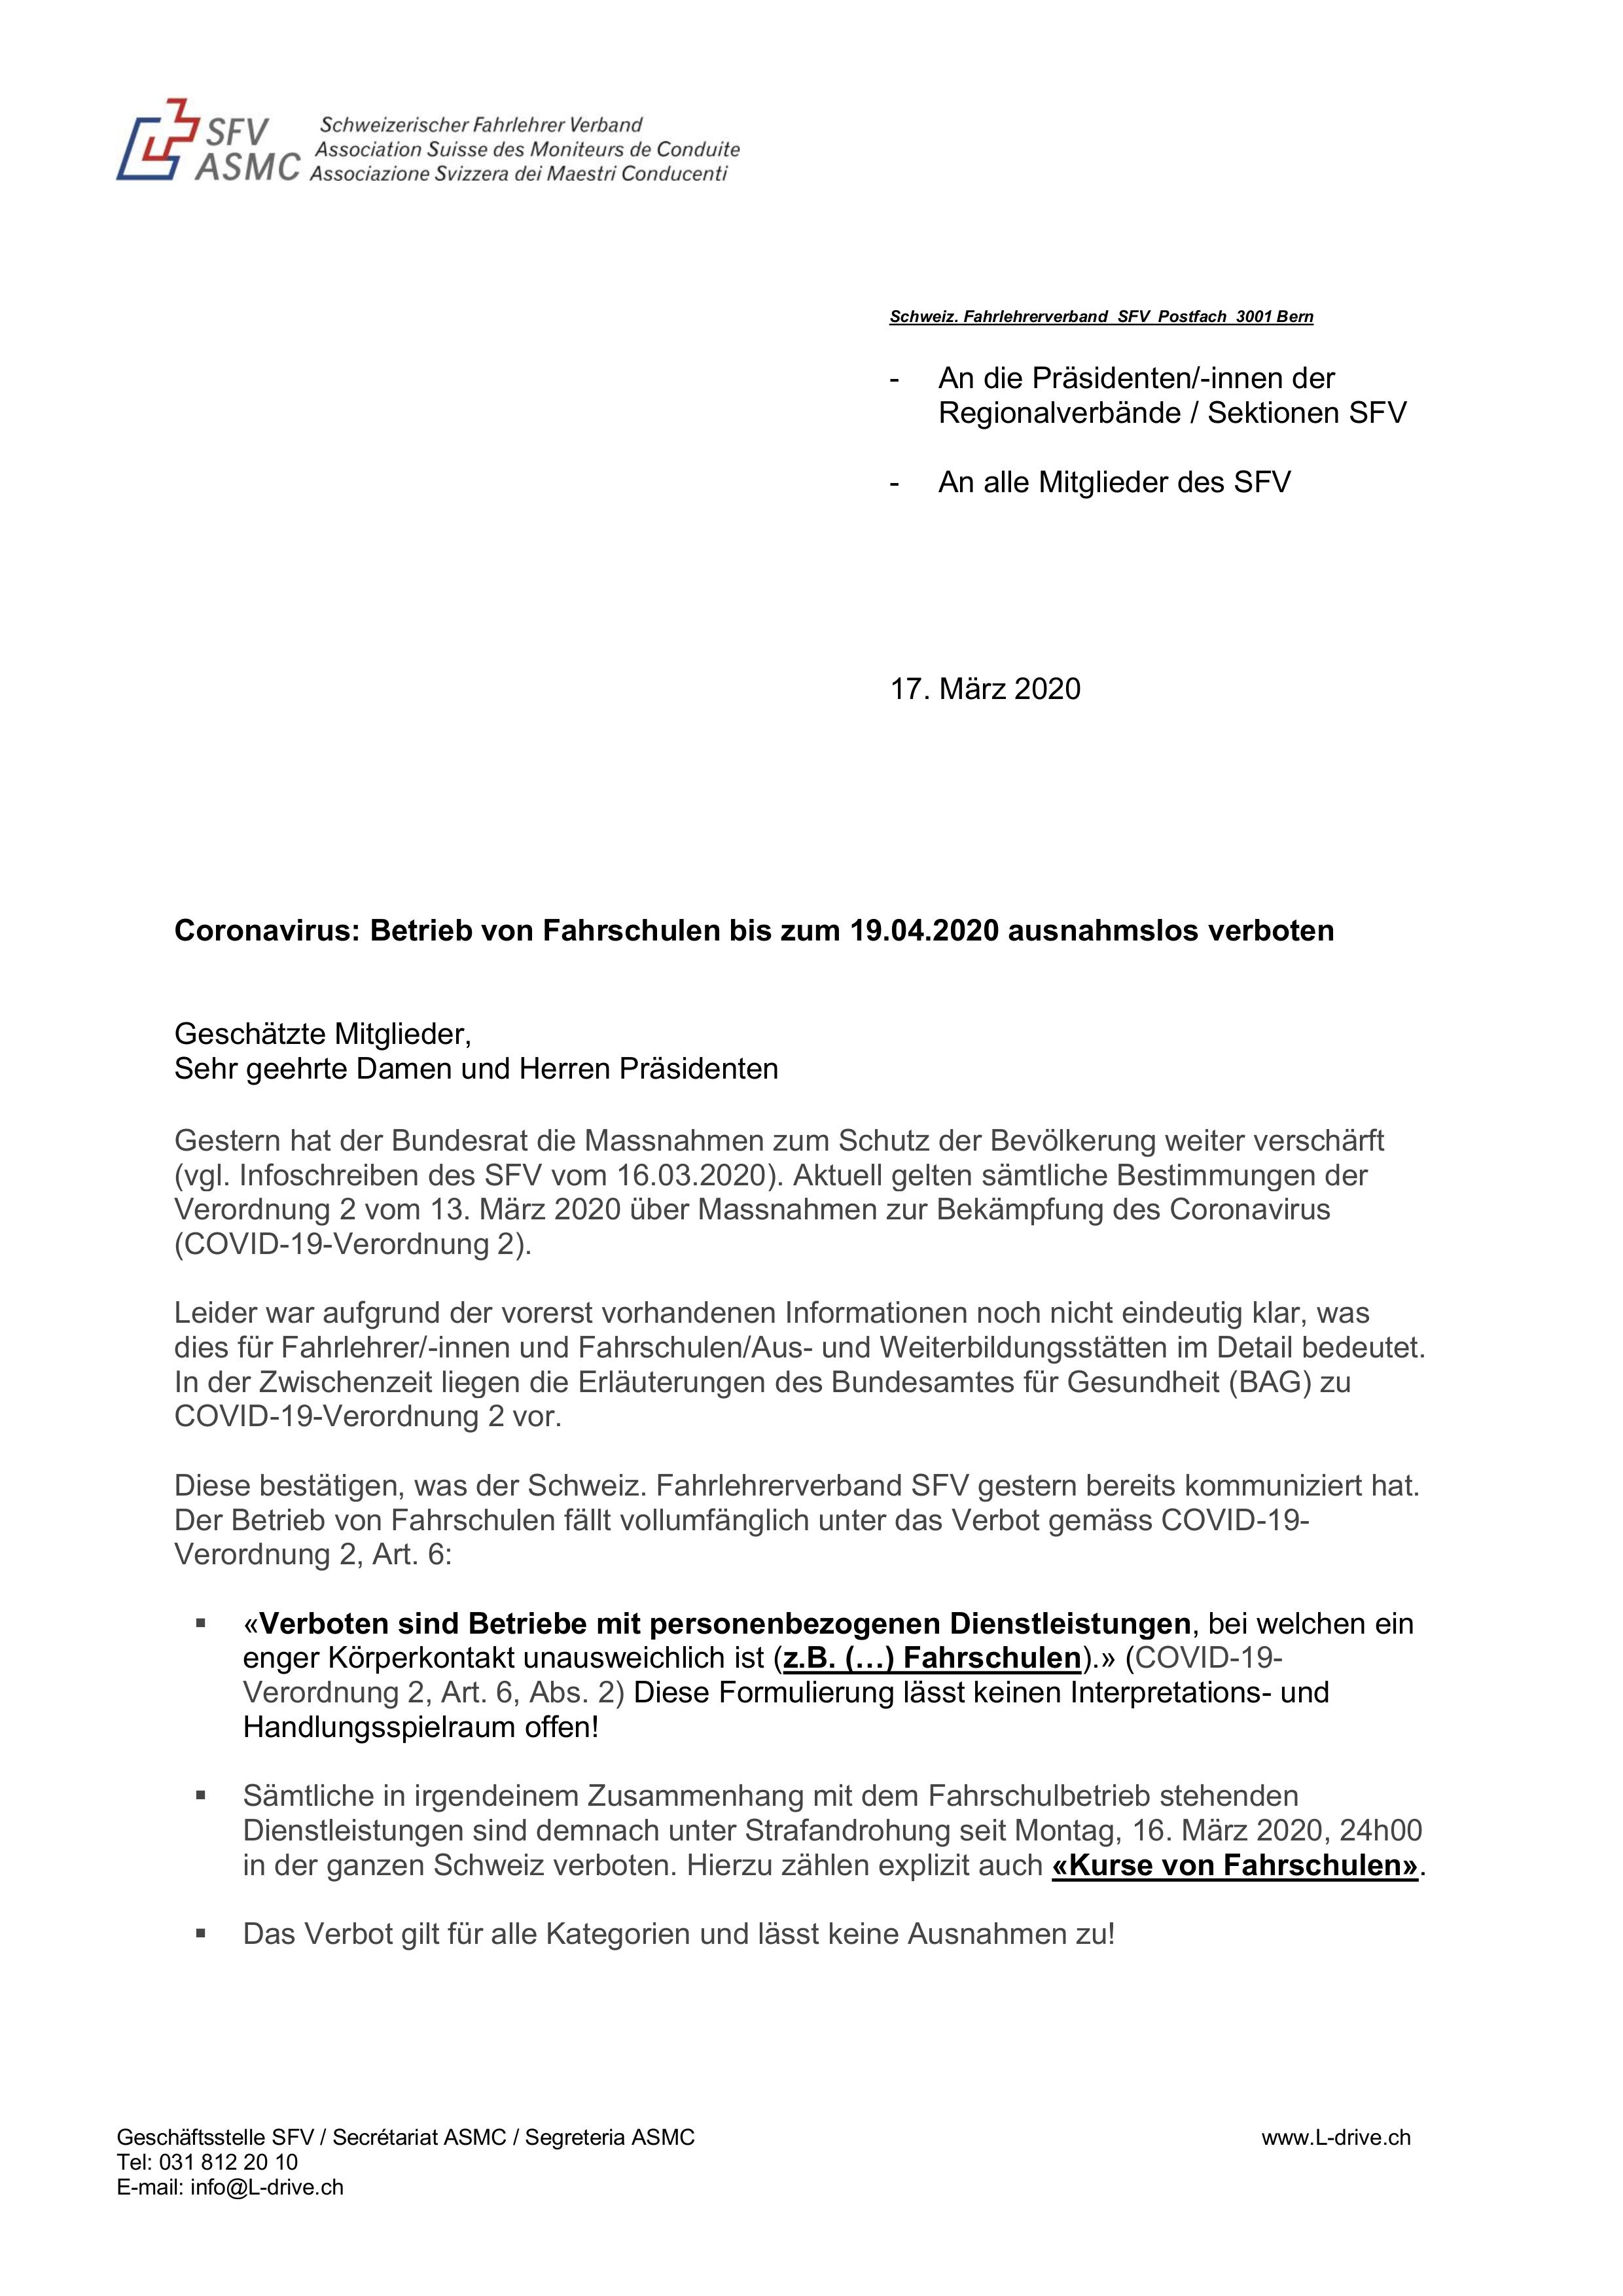 Fahrschule Ackle, Frick, 200317-IN-Corona_Fahrschulen-d (003)